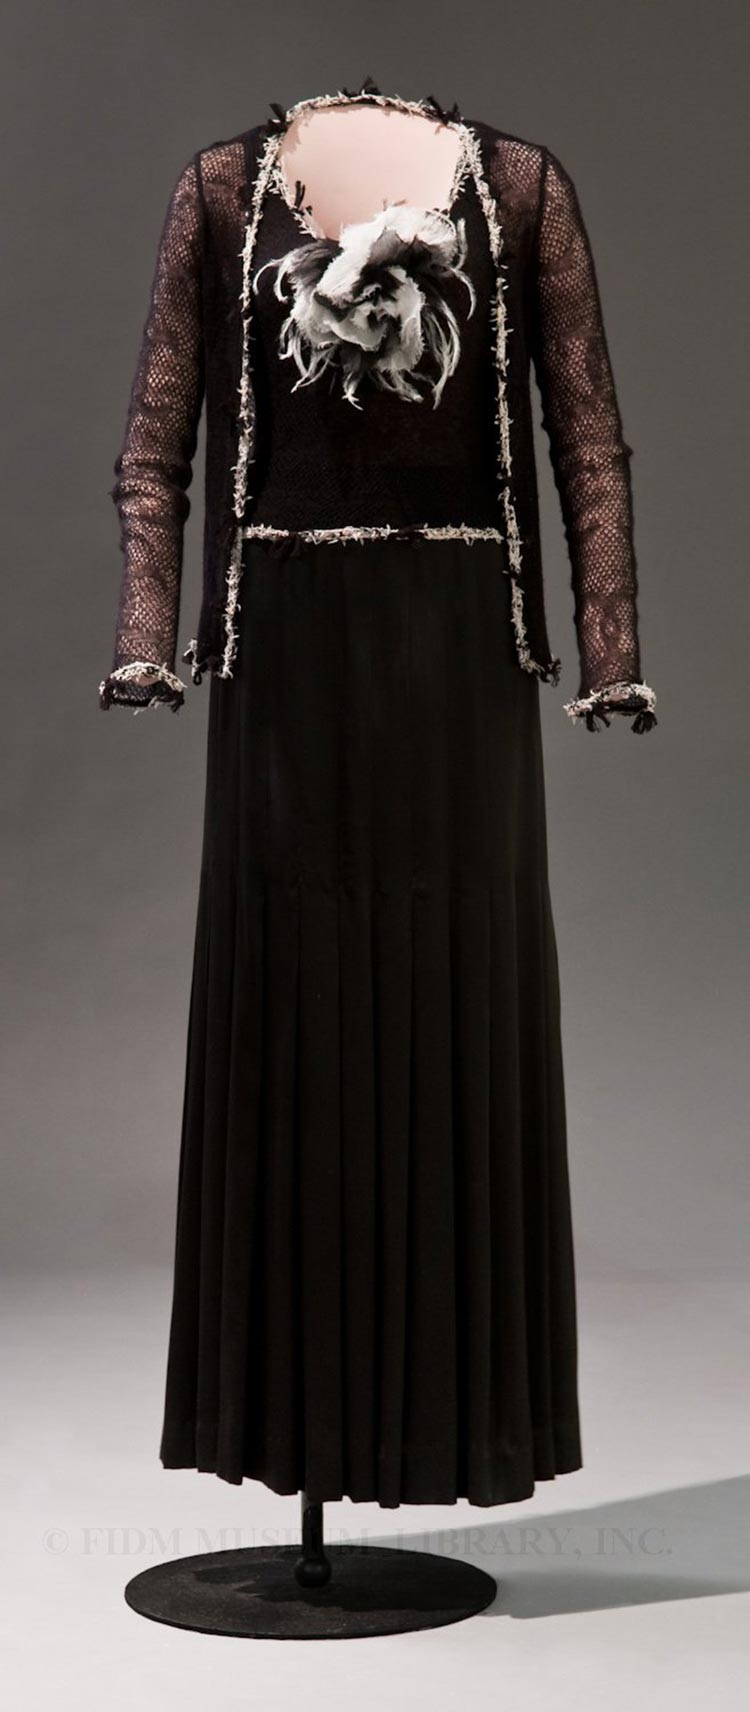 Coco Chanel black dress